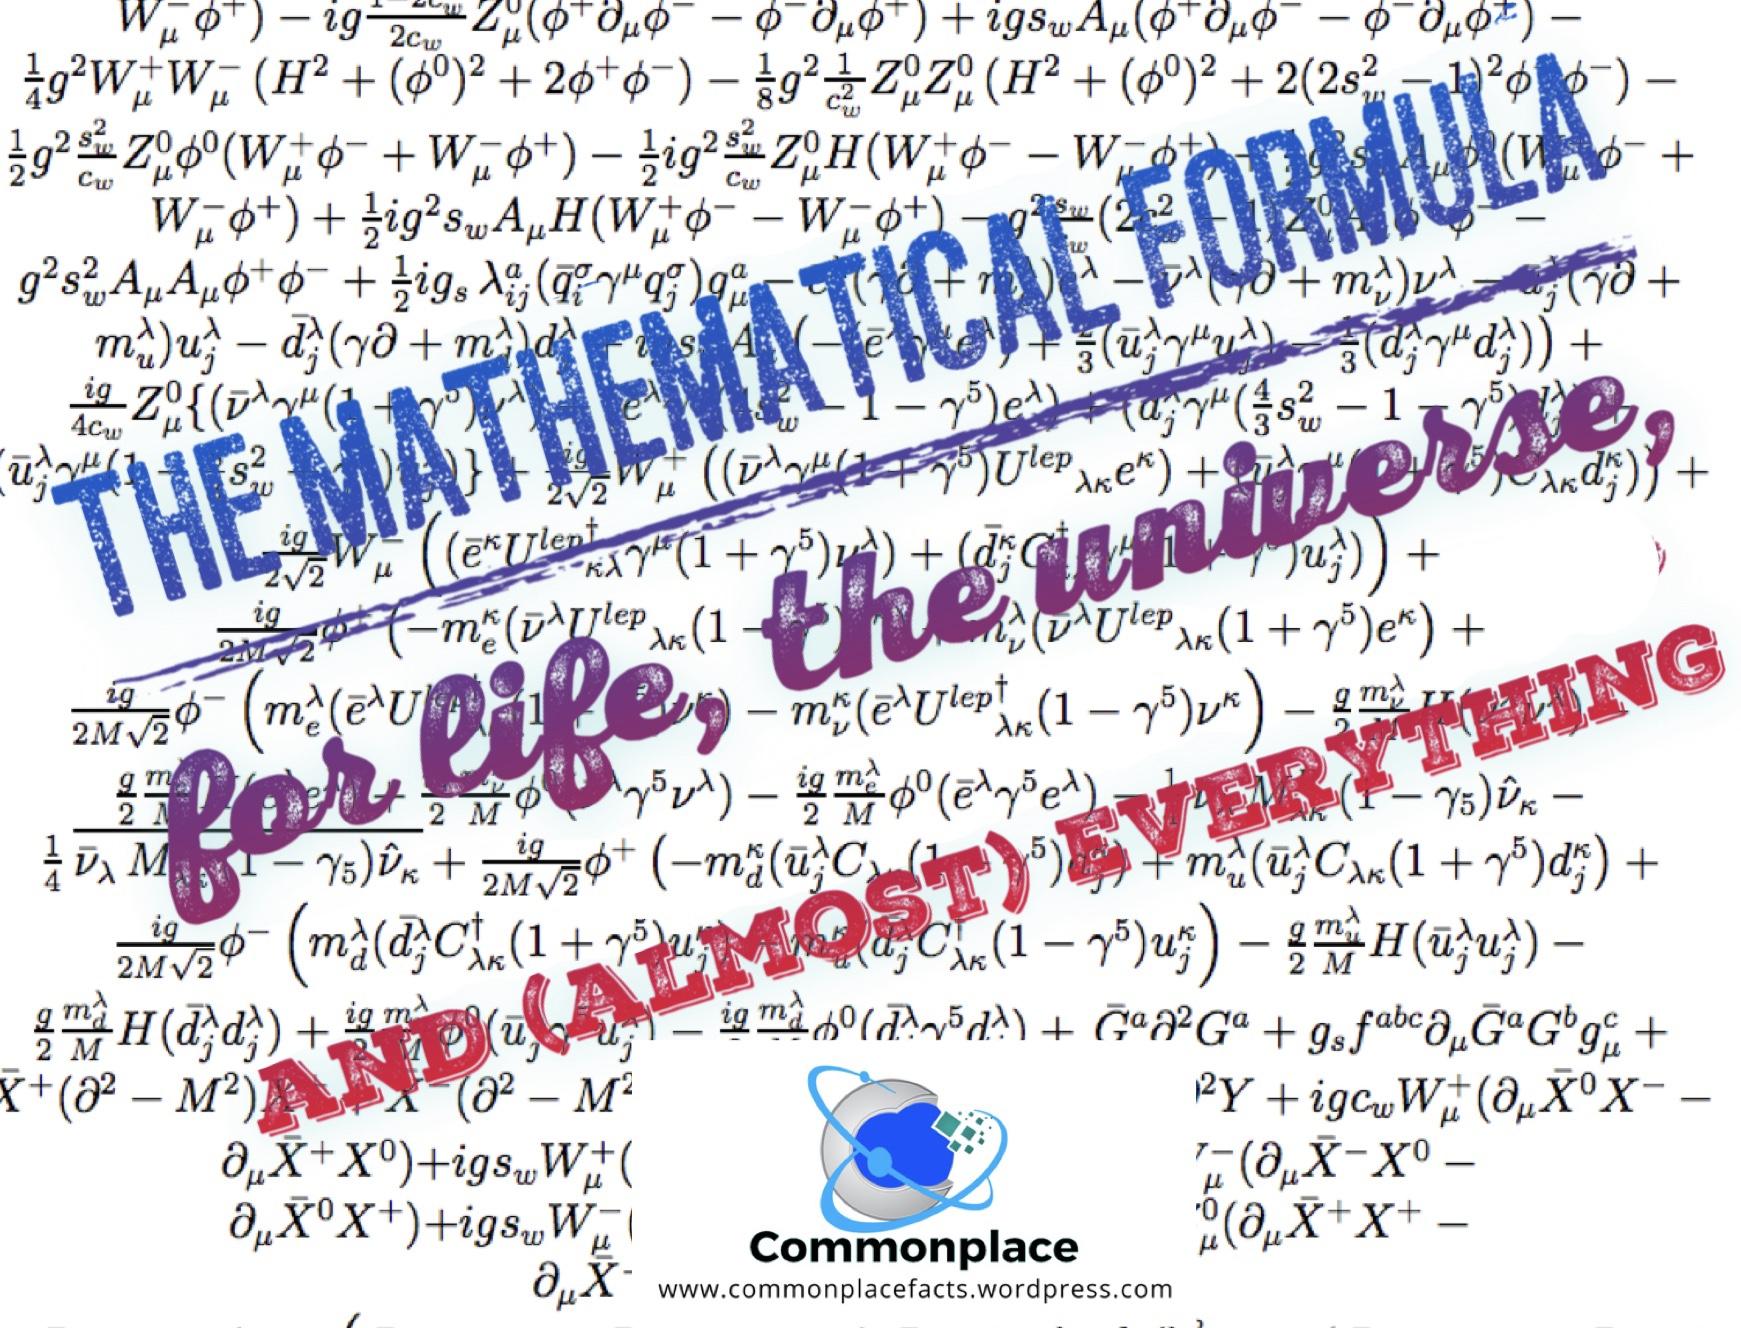 #physics #calculus #quantumtheory #particlephysics #standardmodel #lagrangian